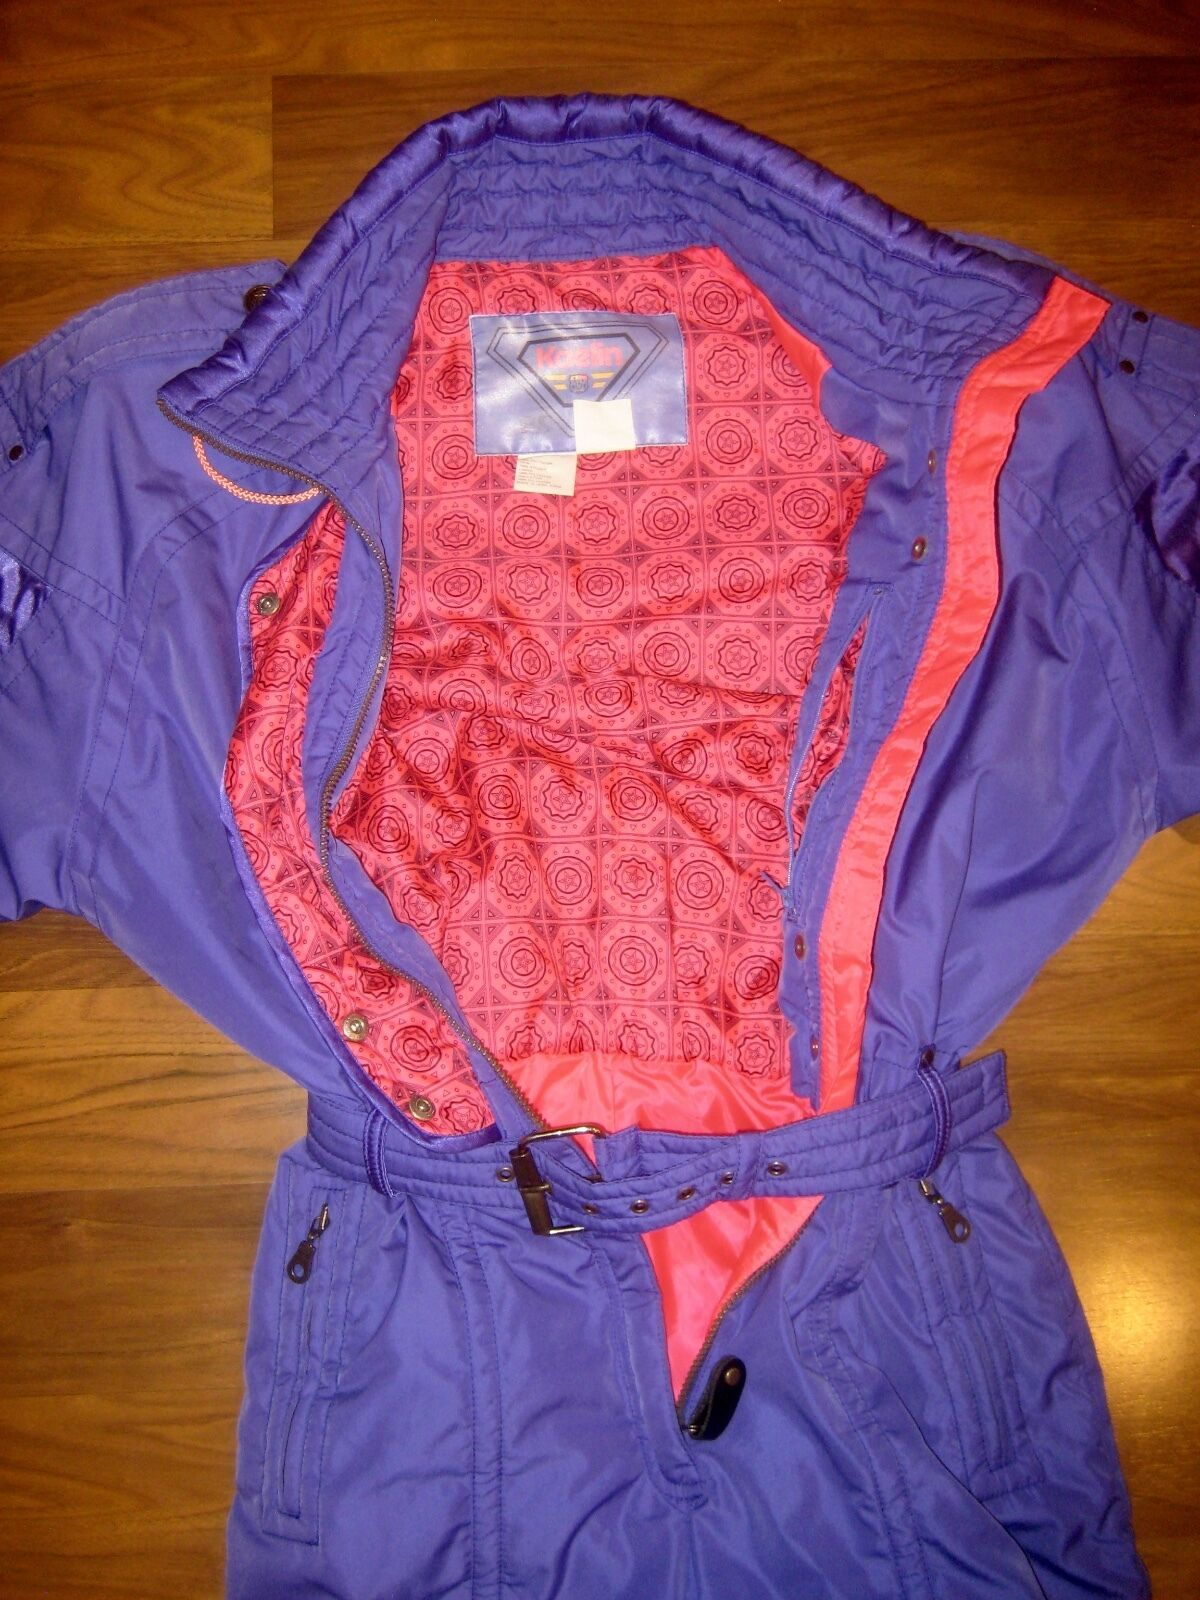 Vtg 80s KAELIN Purple WOMENS 10 One piece SKI SUIT Snow bib Snowsuit Gaper Apres